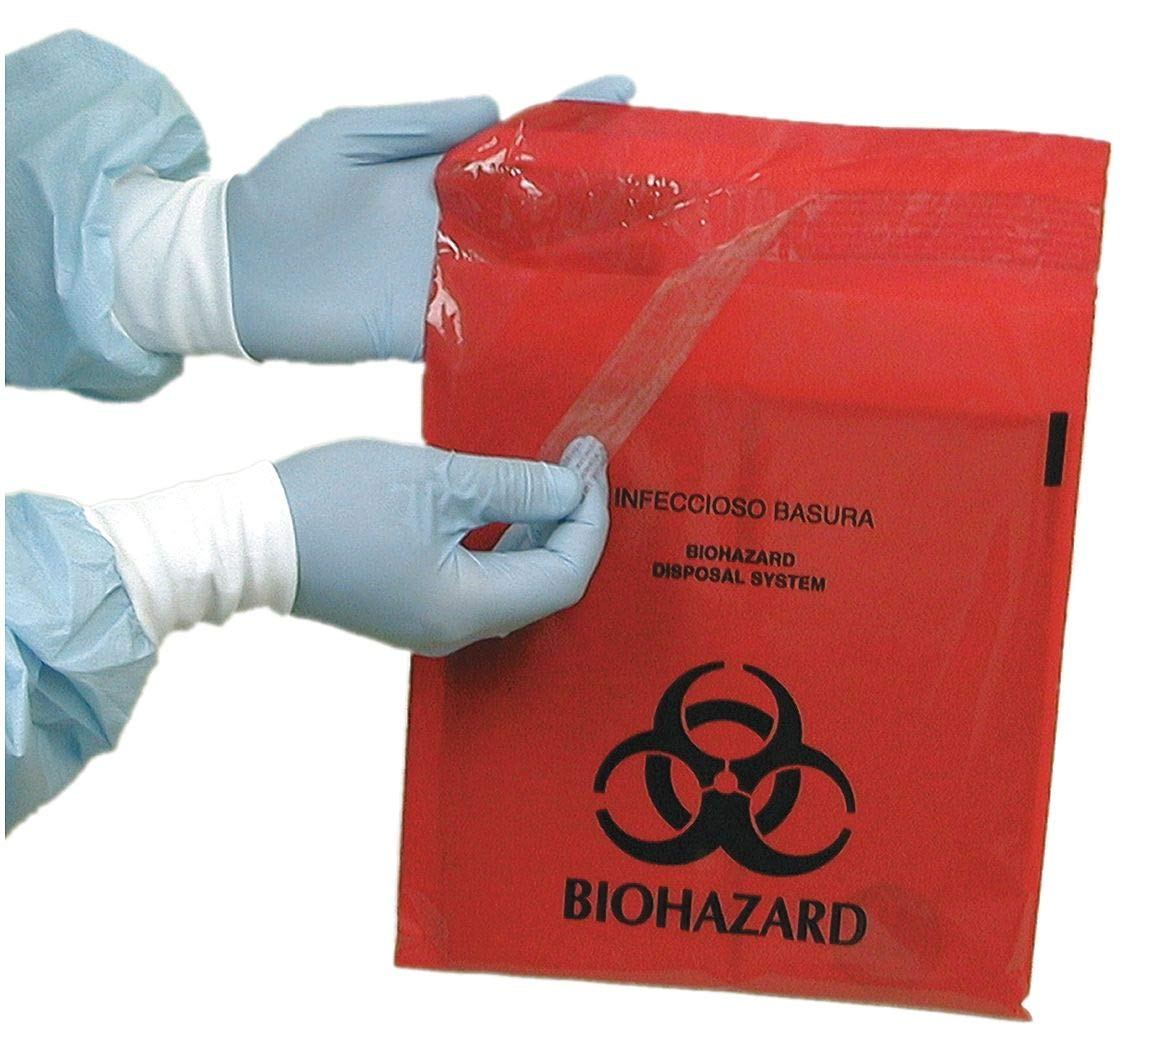 2.6 qt. Red Biohazard Bag, Super Heavy Strength Rating, Flat Pack, 100 PK - MRWB142324